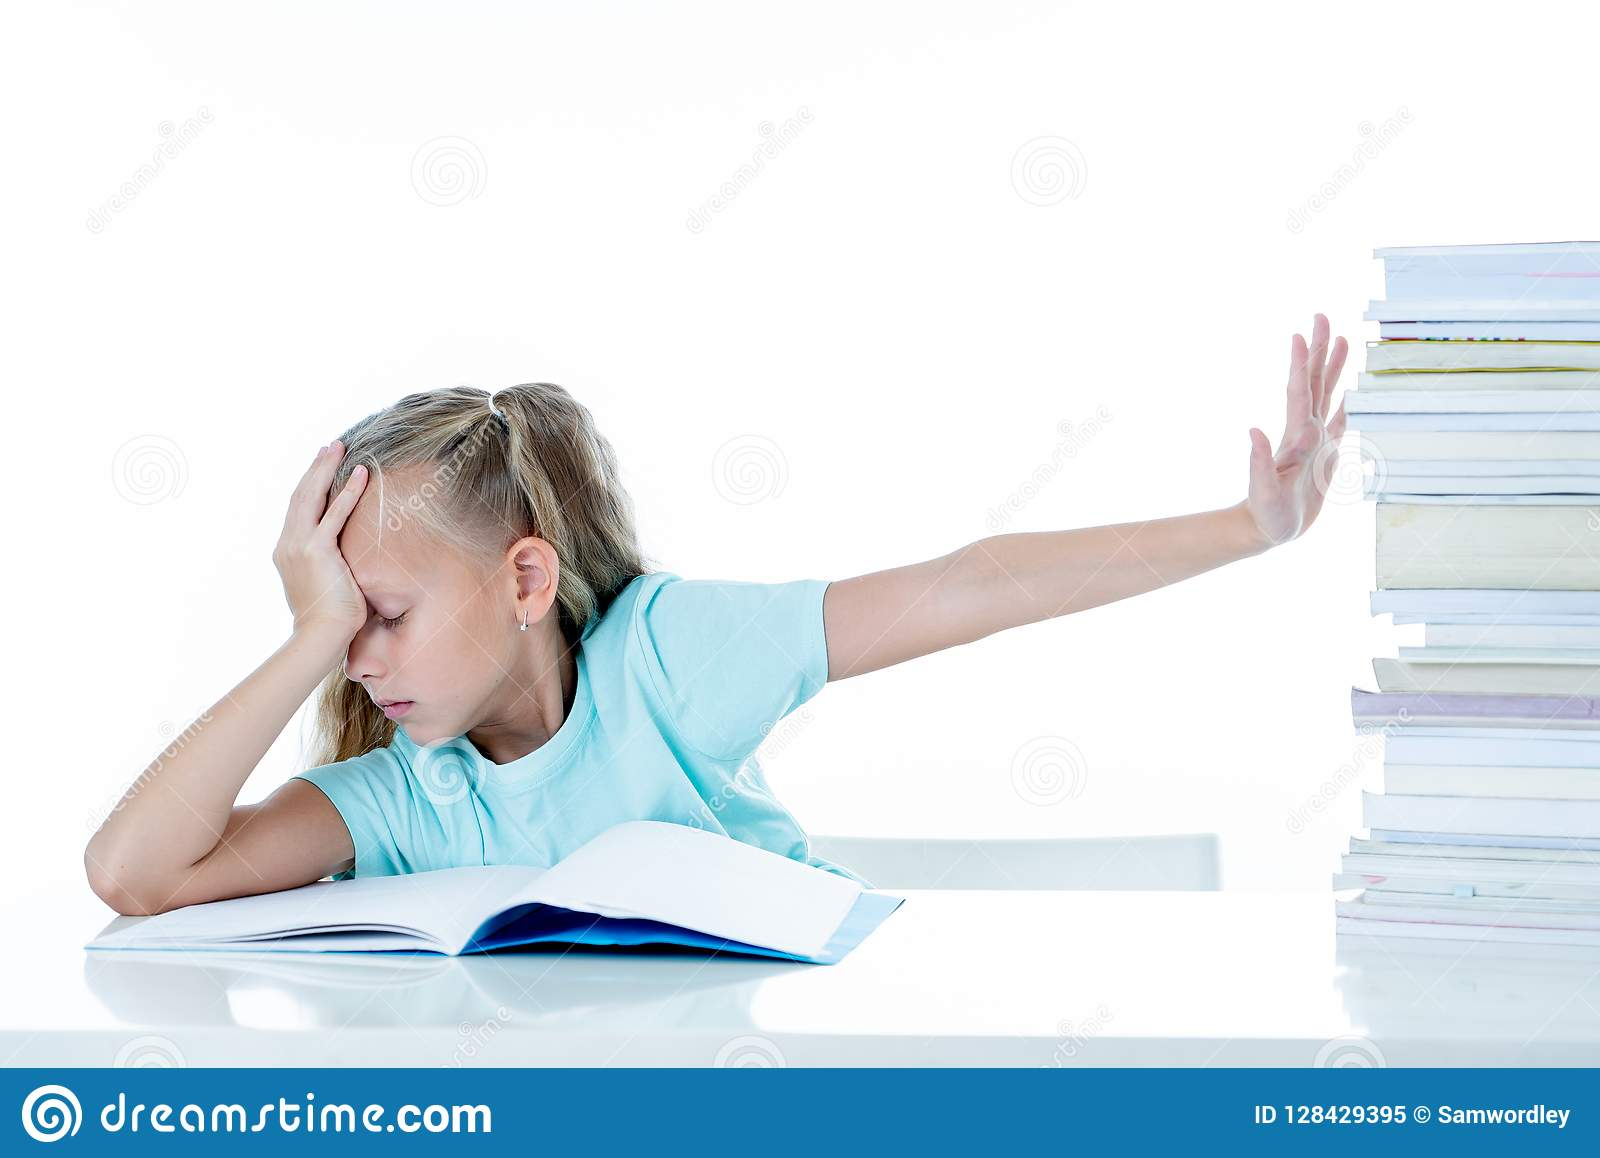 Education homework schoolwork homework ghostwriters services usa